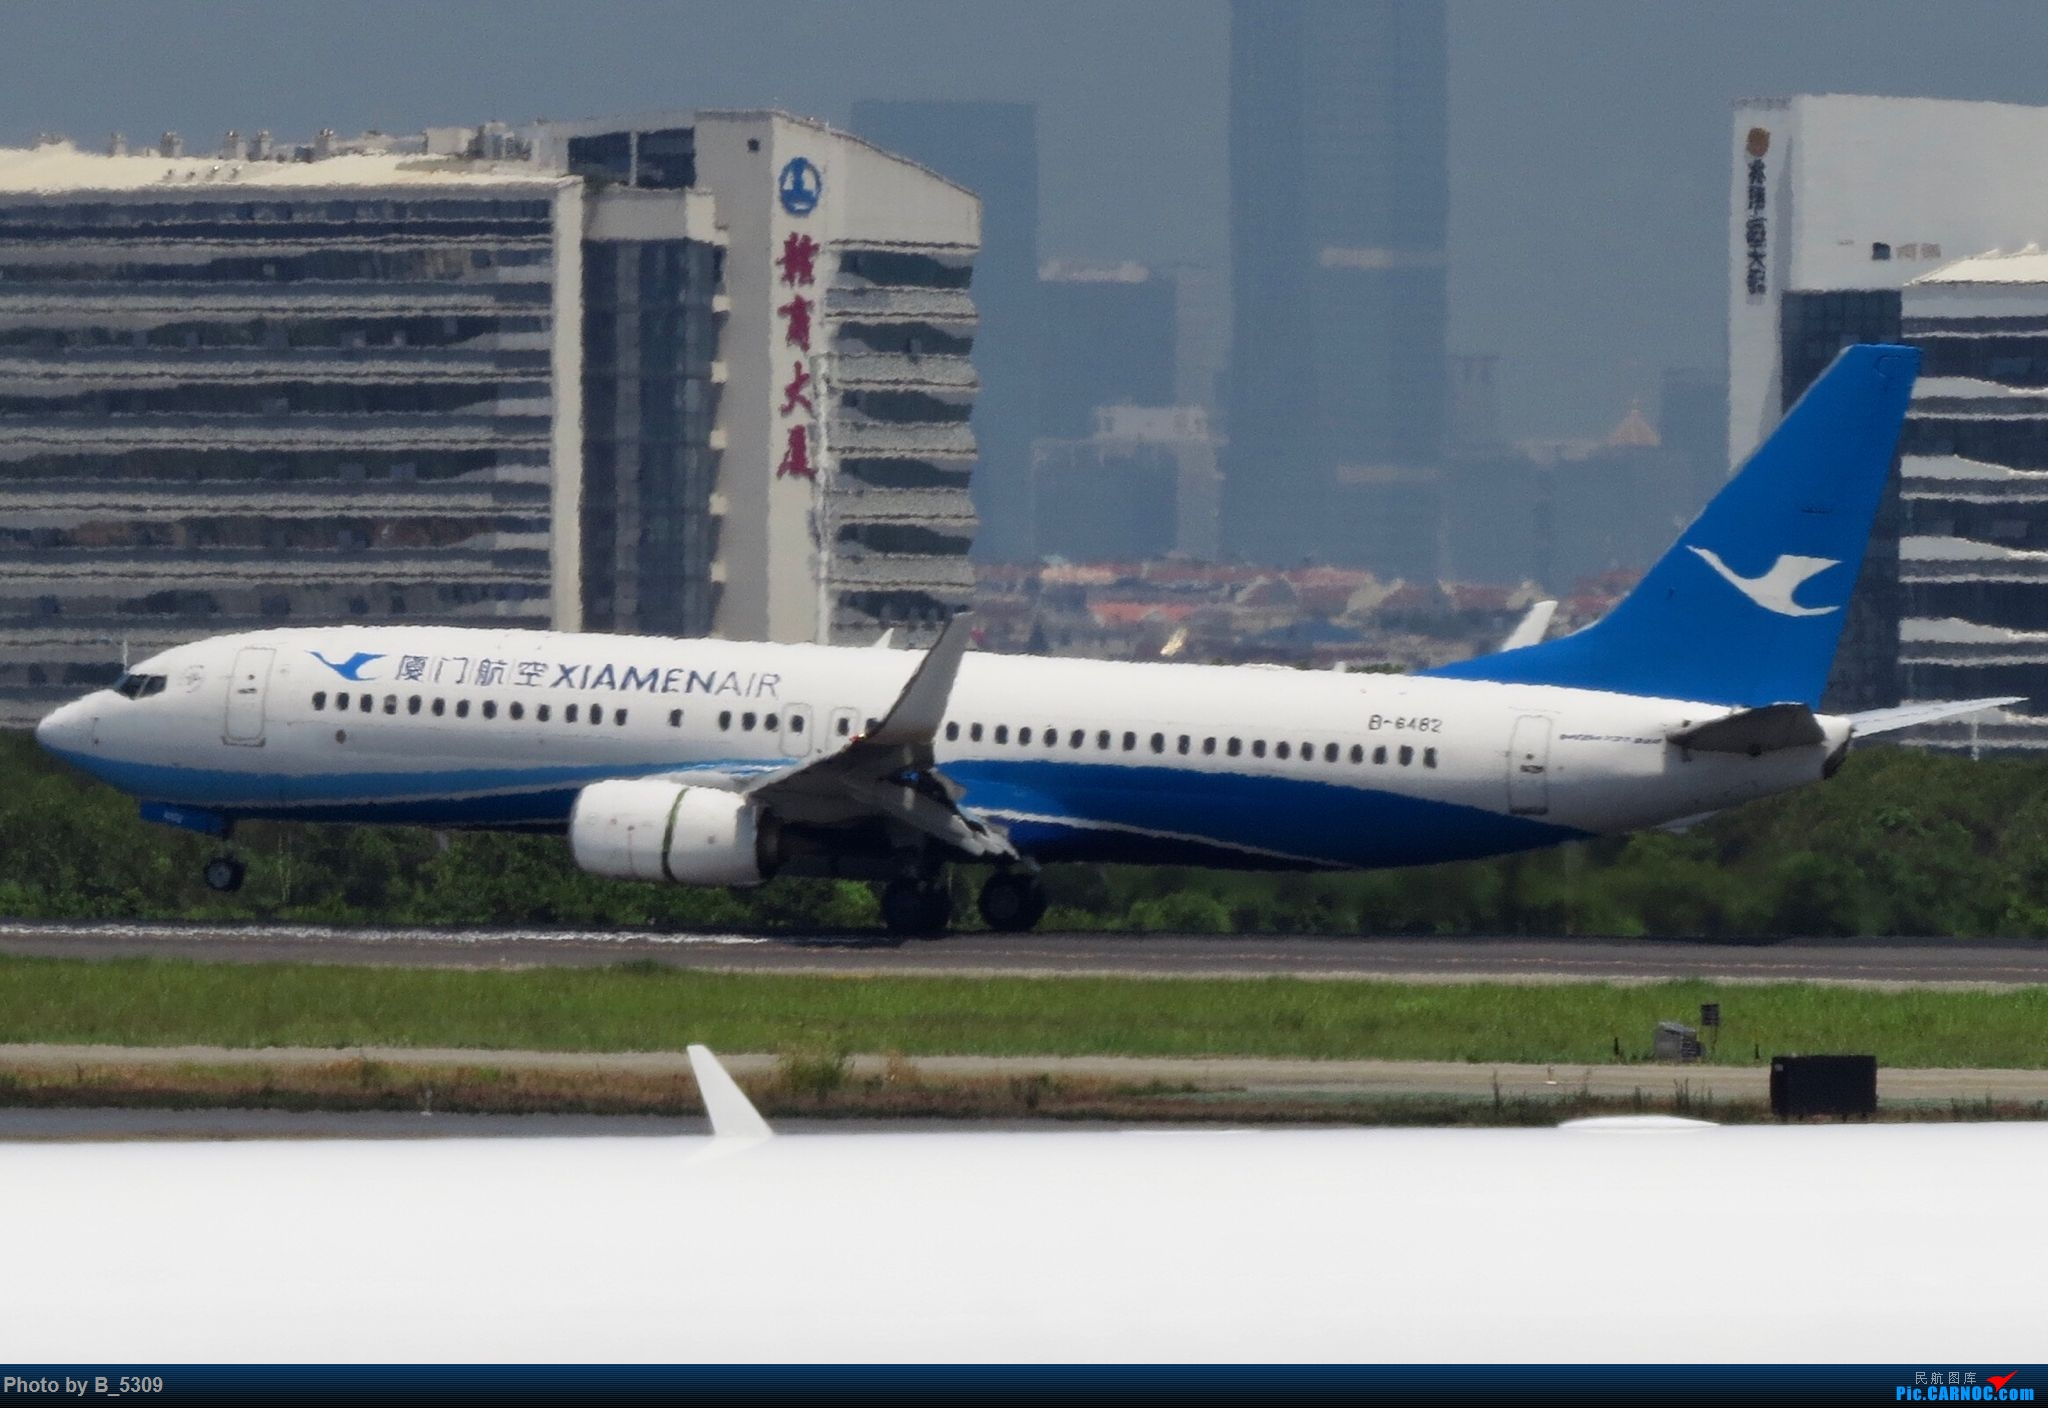 Re:[原创]逮KLM的大中午… BOEING 737-800 B-6482 中国厦门高崎国际机场